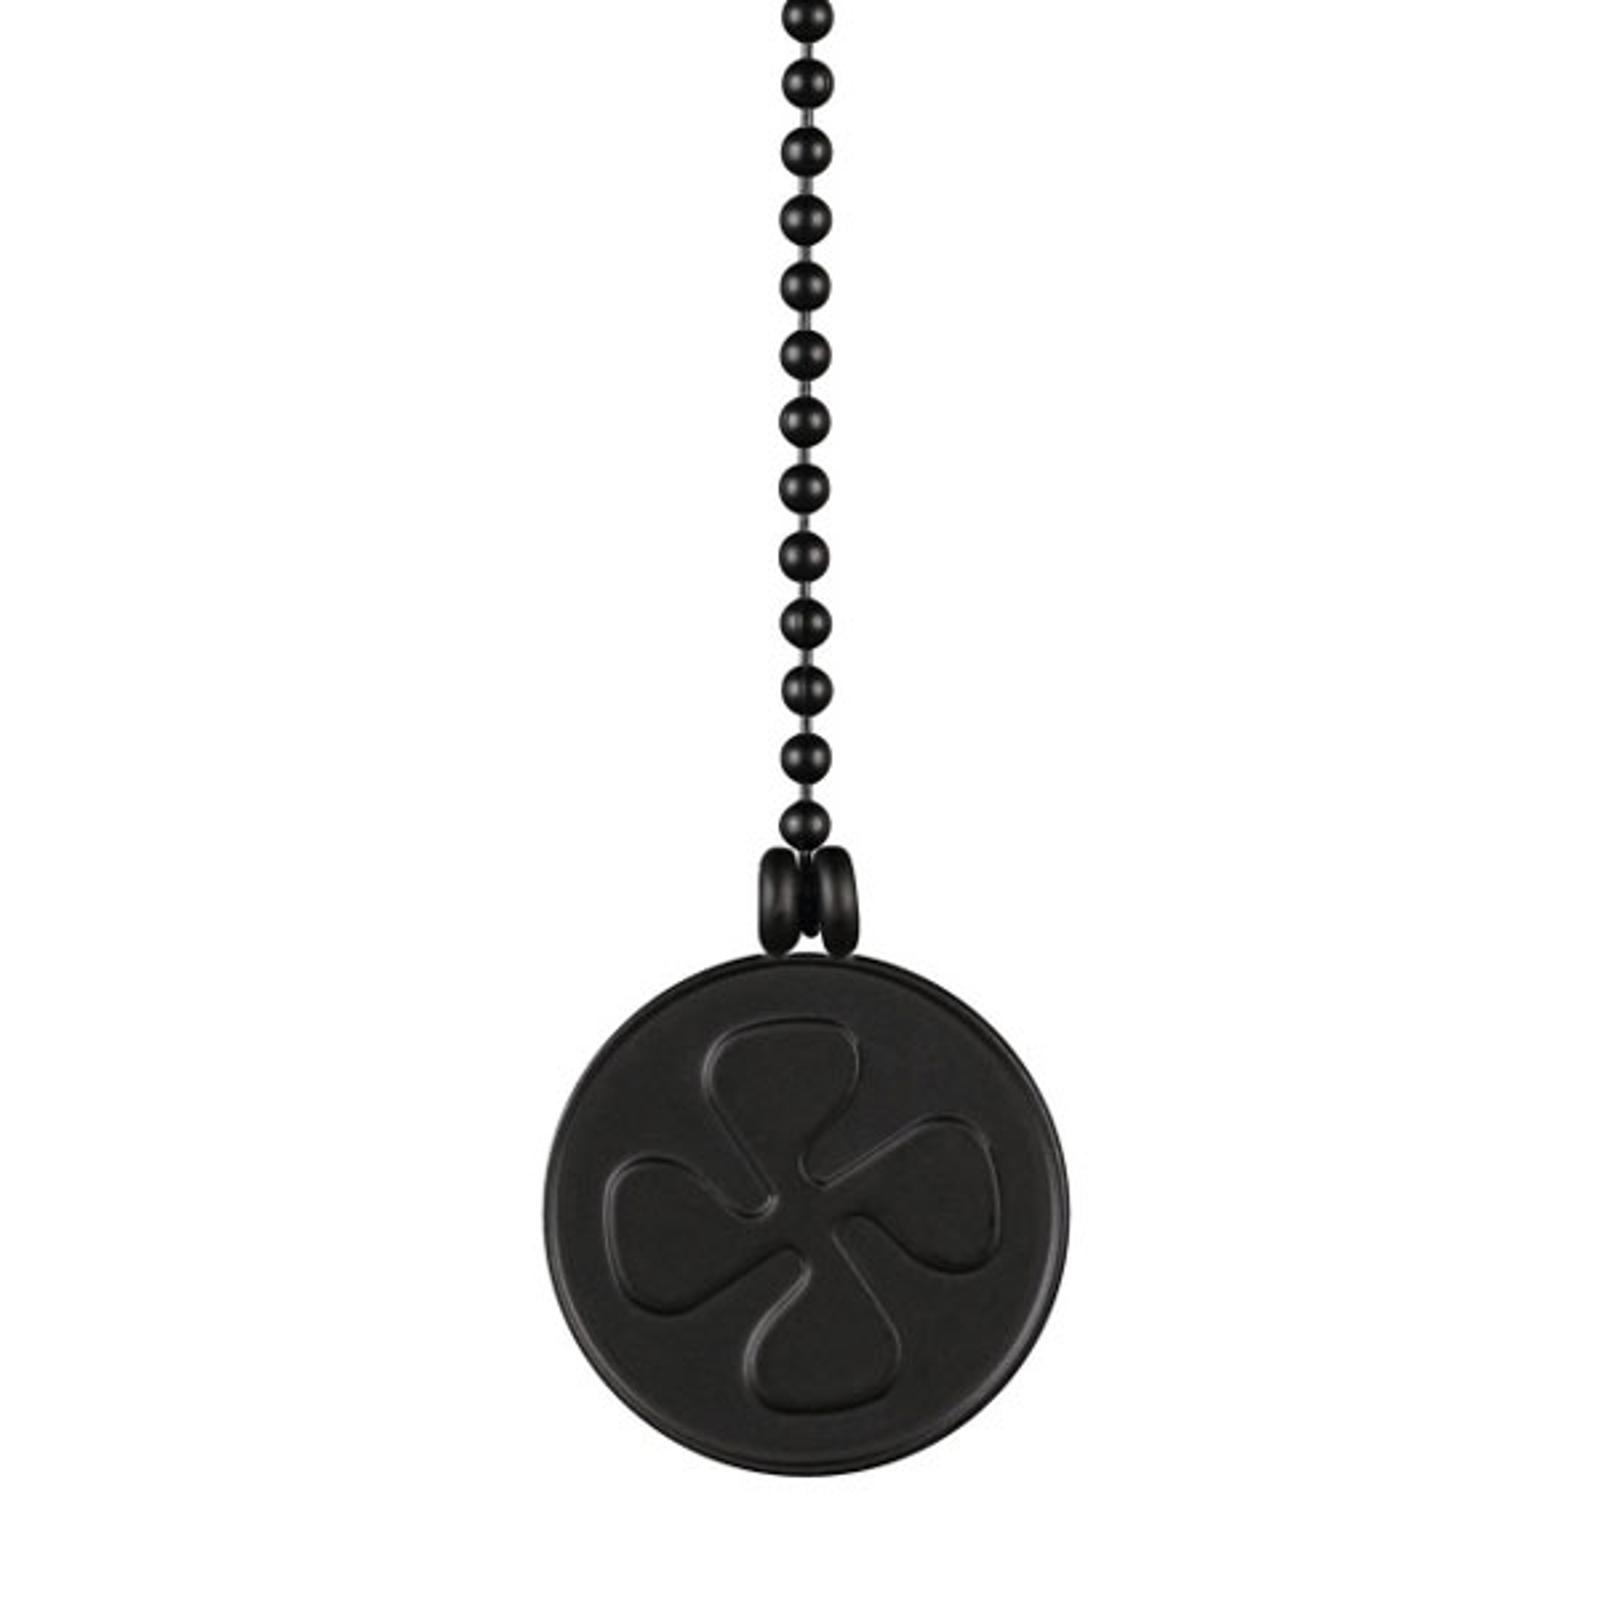 Westinghouse ventilator medaljon kæde sort